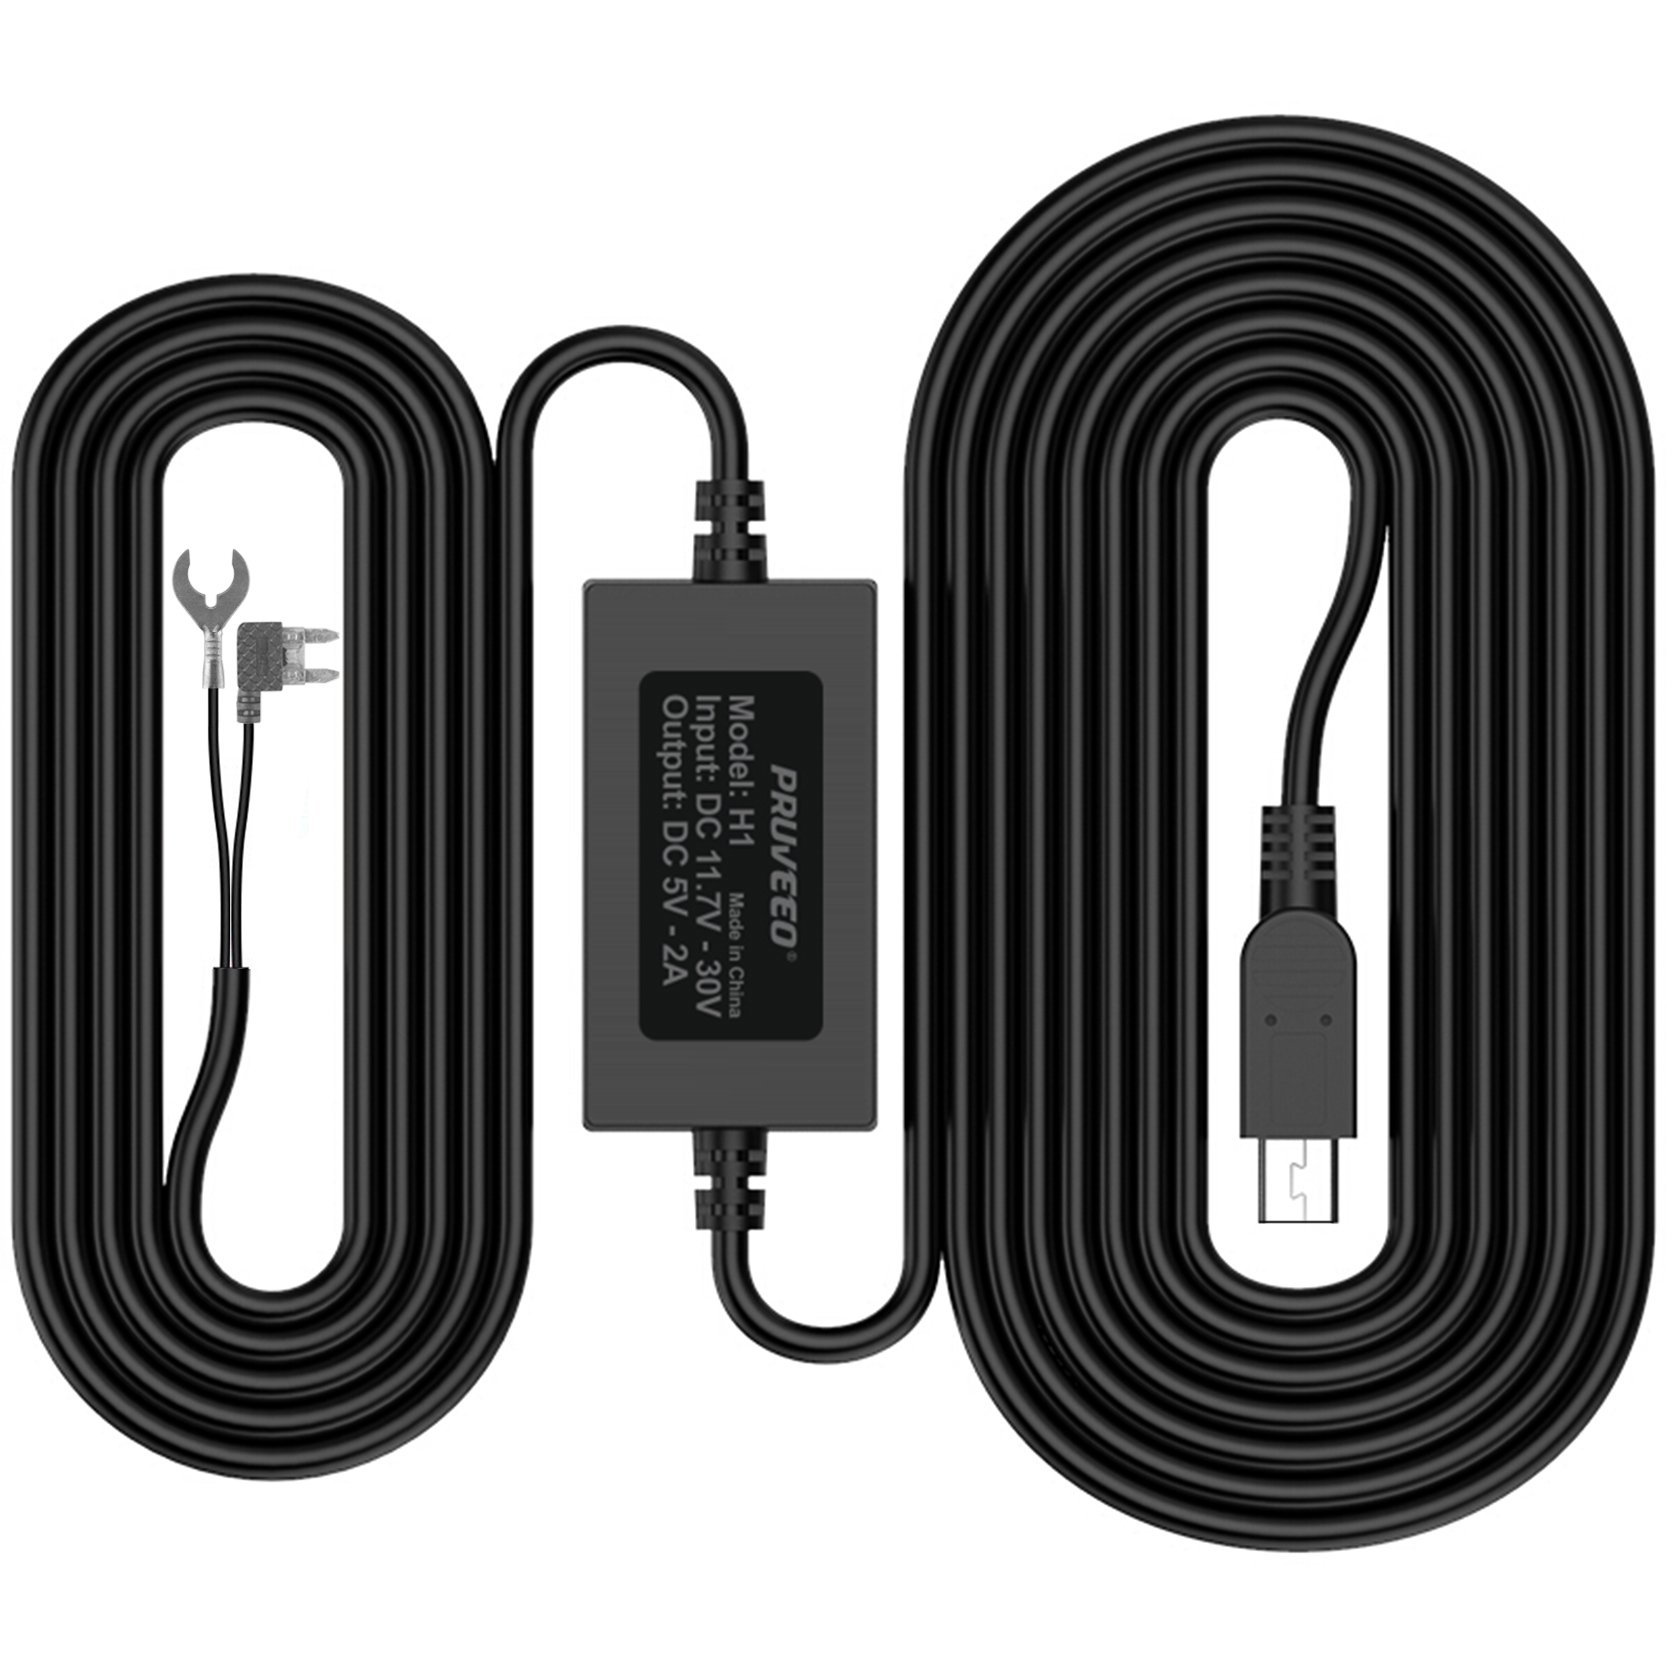 Pruveeo Hard Wire Kit for Dash Cam, Mini USB Port, 12V to 5V, DC 12V - 30V Car Charger Cable Kit